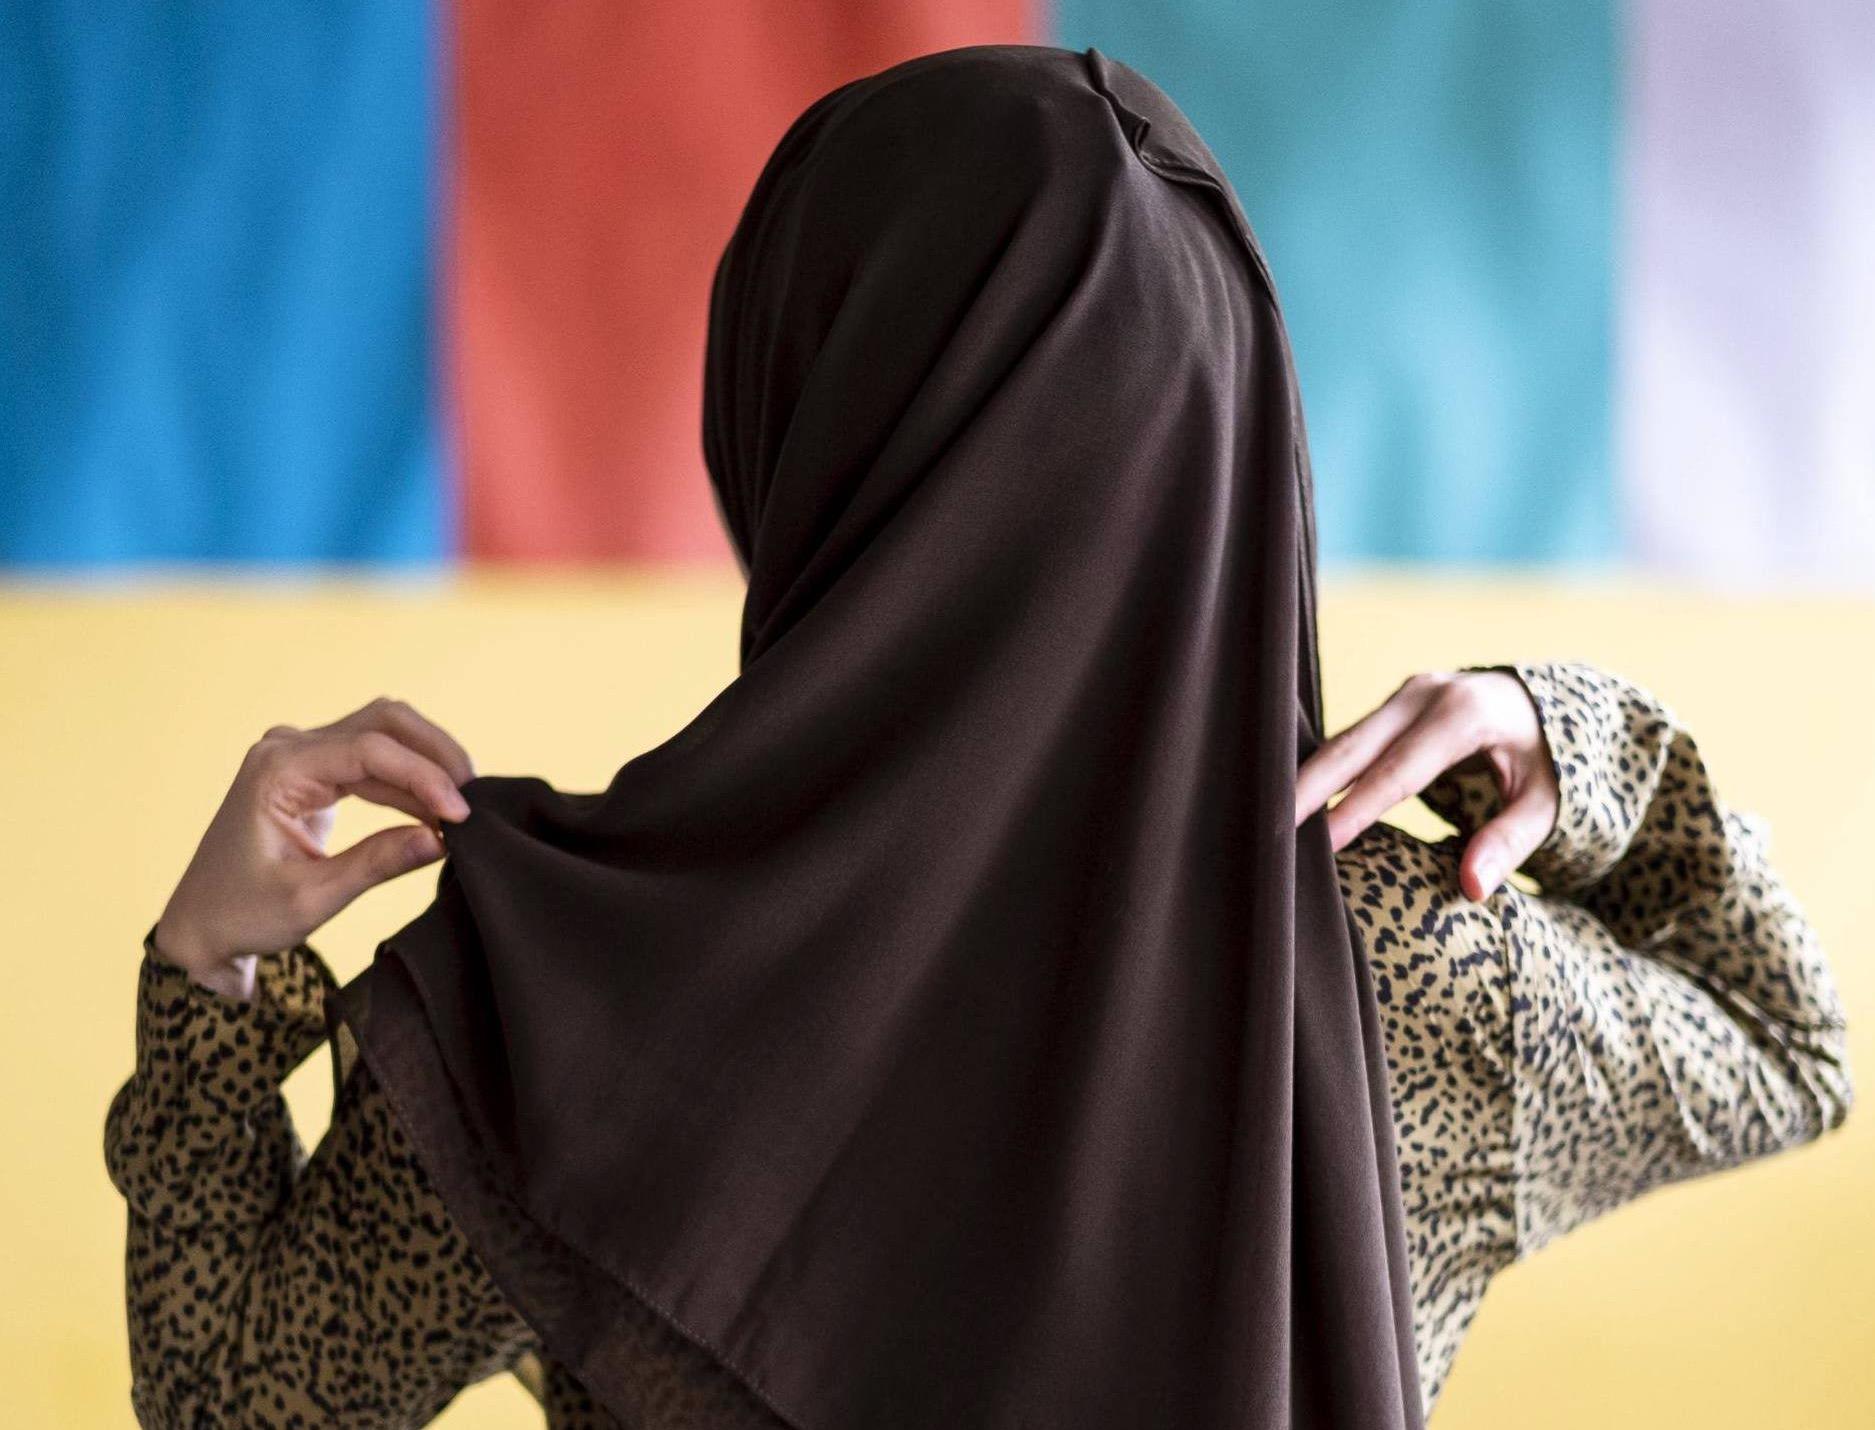 cherche femme converti islam pour mariage